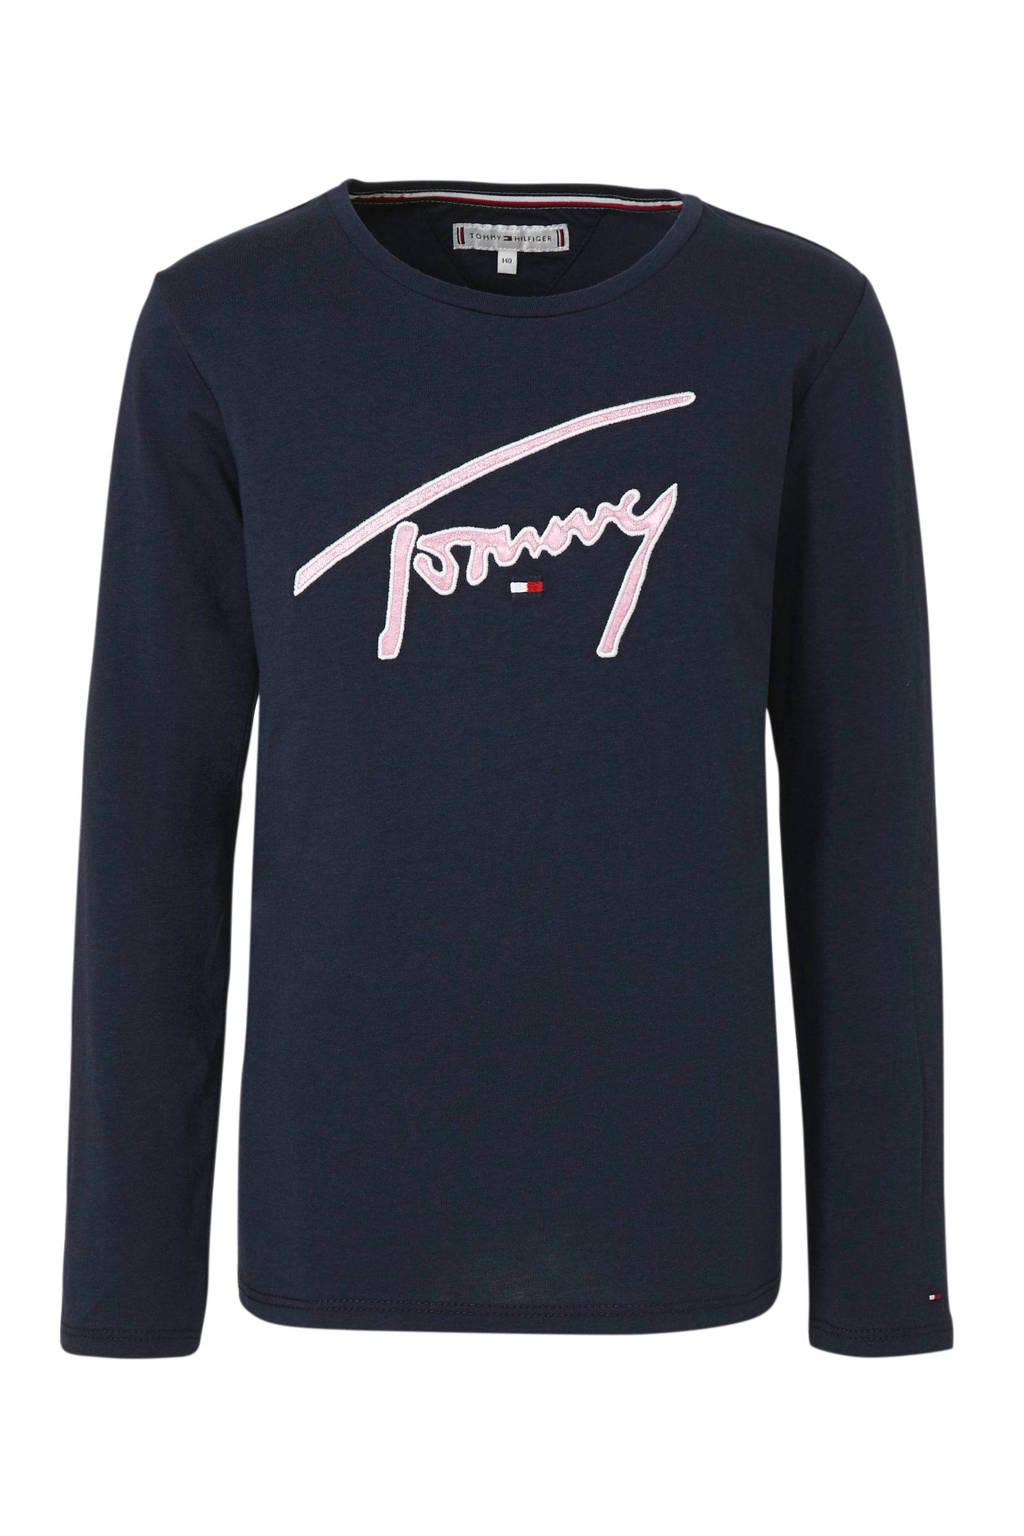 Tommy Hilfiger longsleeve met borduursels donkerblauw, Donkerblauw